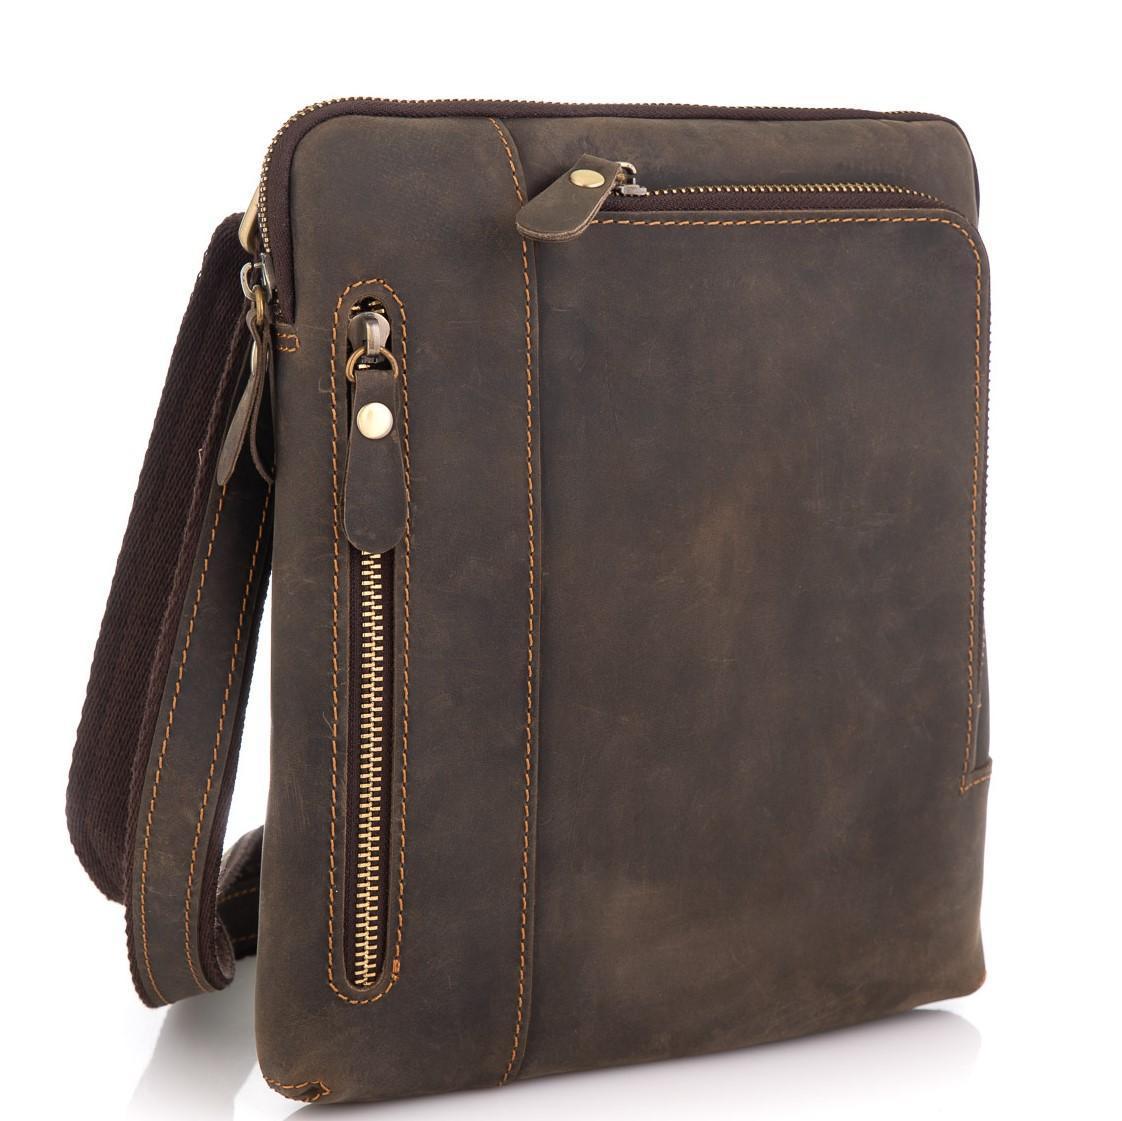 Сумка через плече чоловіча коричнева Tiding Bag t0030R